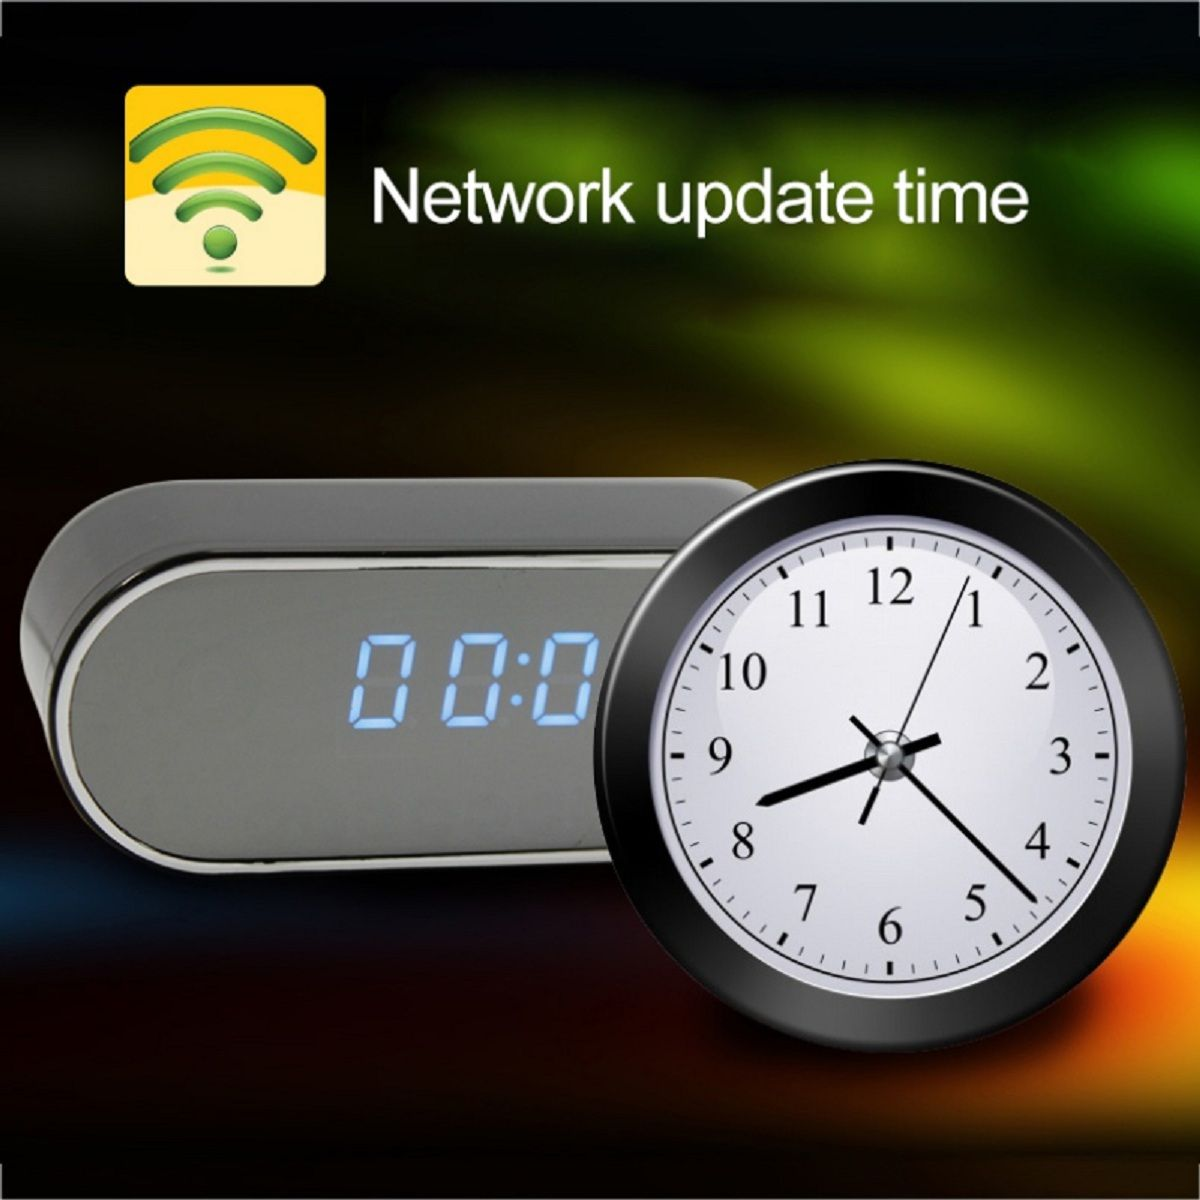 JRGK 1080P HD Uhr Kamera WIFI Steuer Verdeckte IR Nacht Ansicht Alarm Camcorder PK Z16 Digitale Uhr Video Kamera mini DV DVR